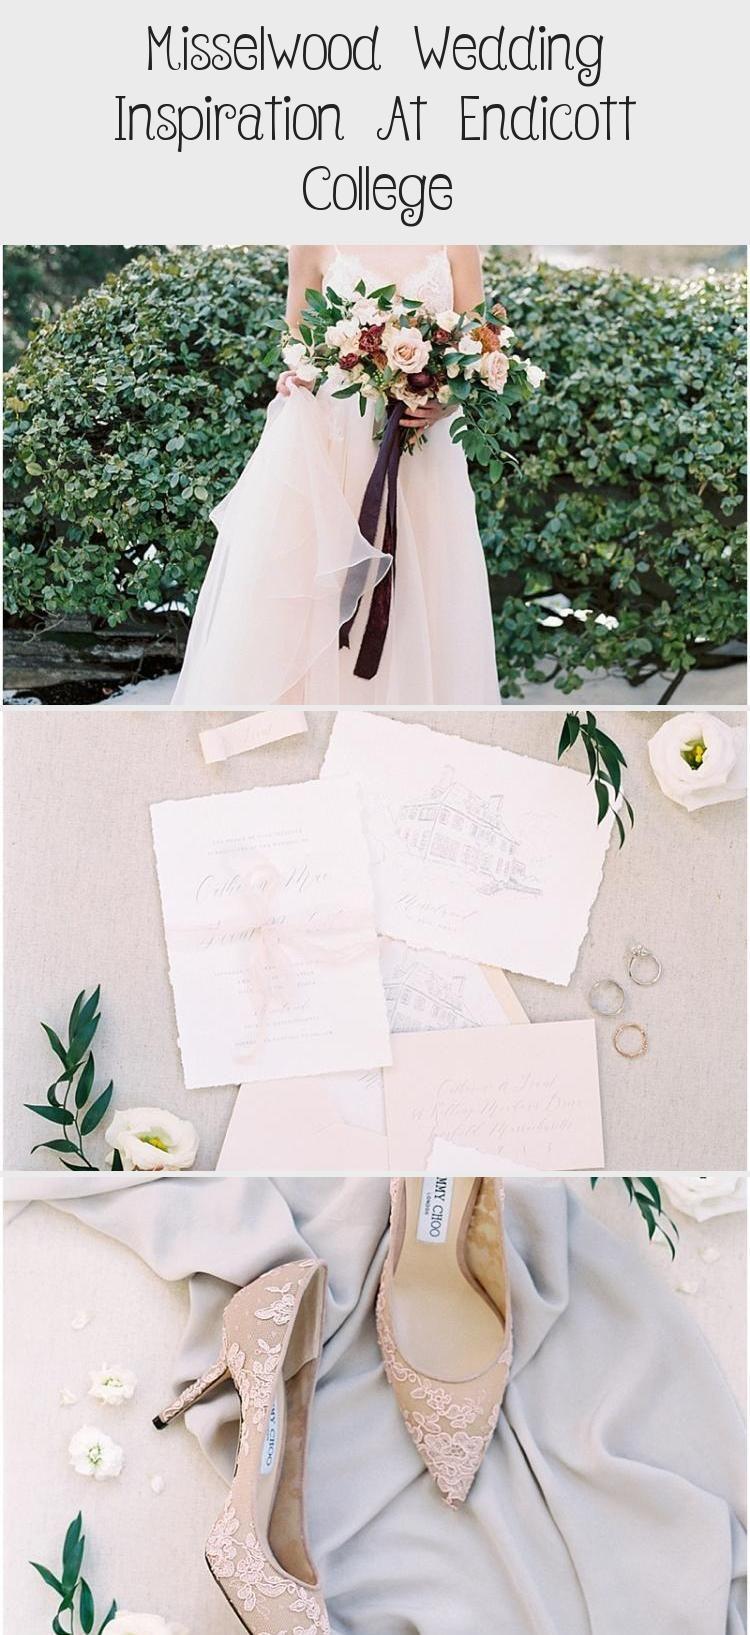 Misselwood Wedding Inspiration At Endicott College In 2020 Wedding Details Film Wedding Photographer Wedding Inspiration